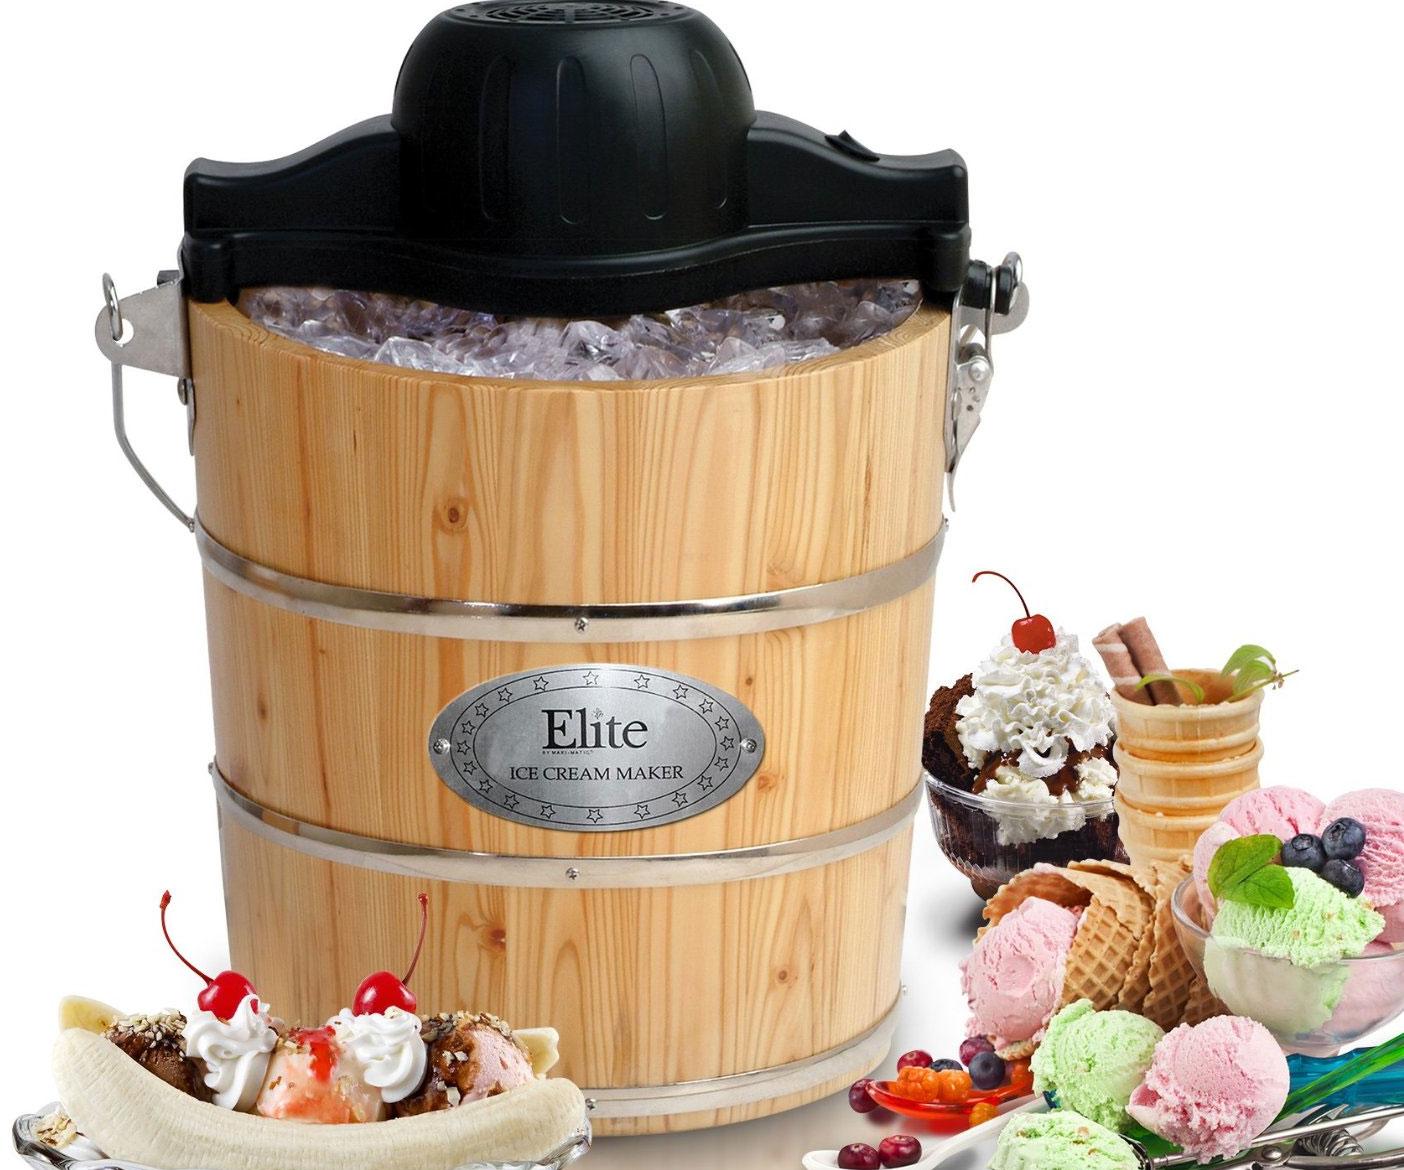 Old Fashioned Bucket Ice Cream Maker